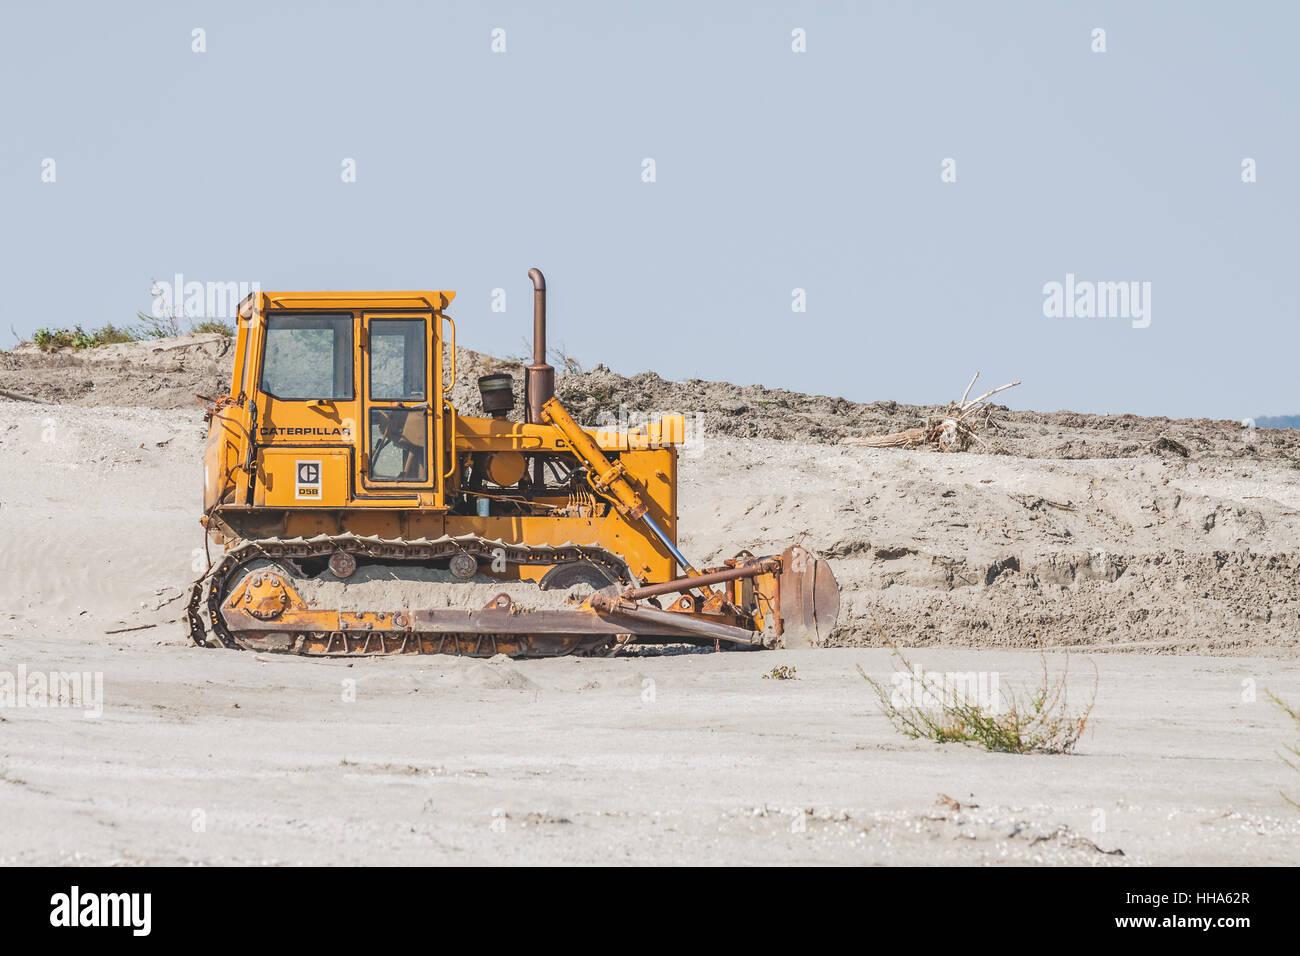 CATERPILLAR d5b Crawler Tractor Track bulldozer in the sand